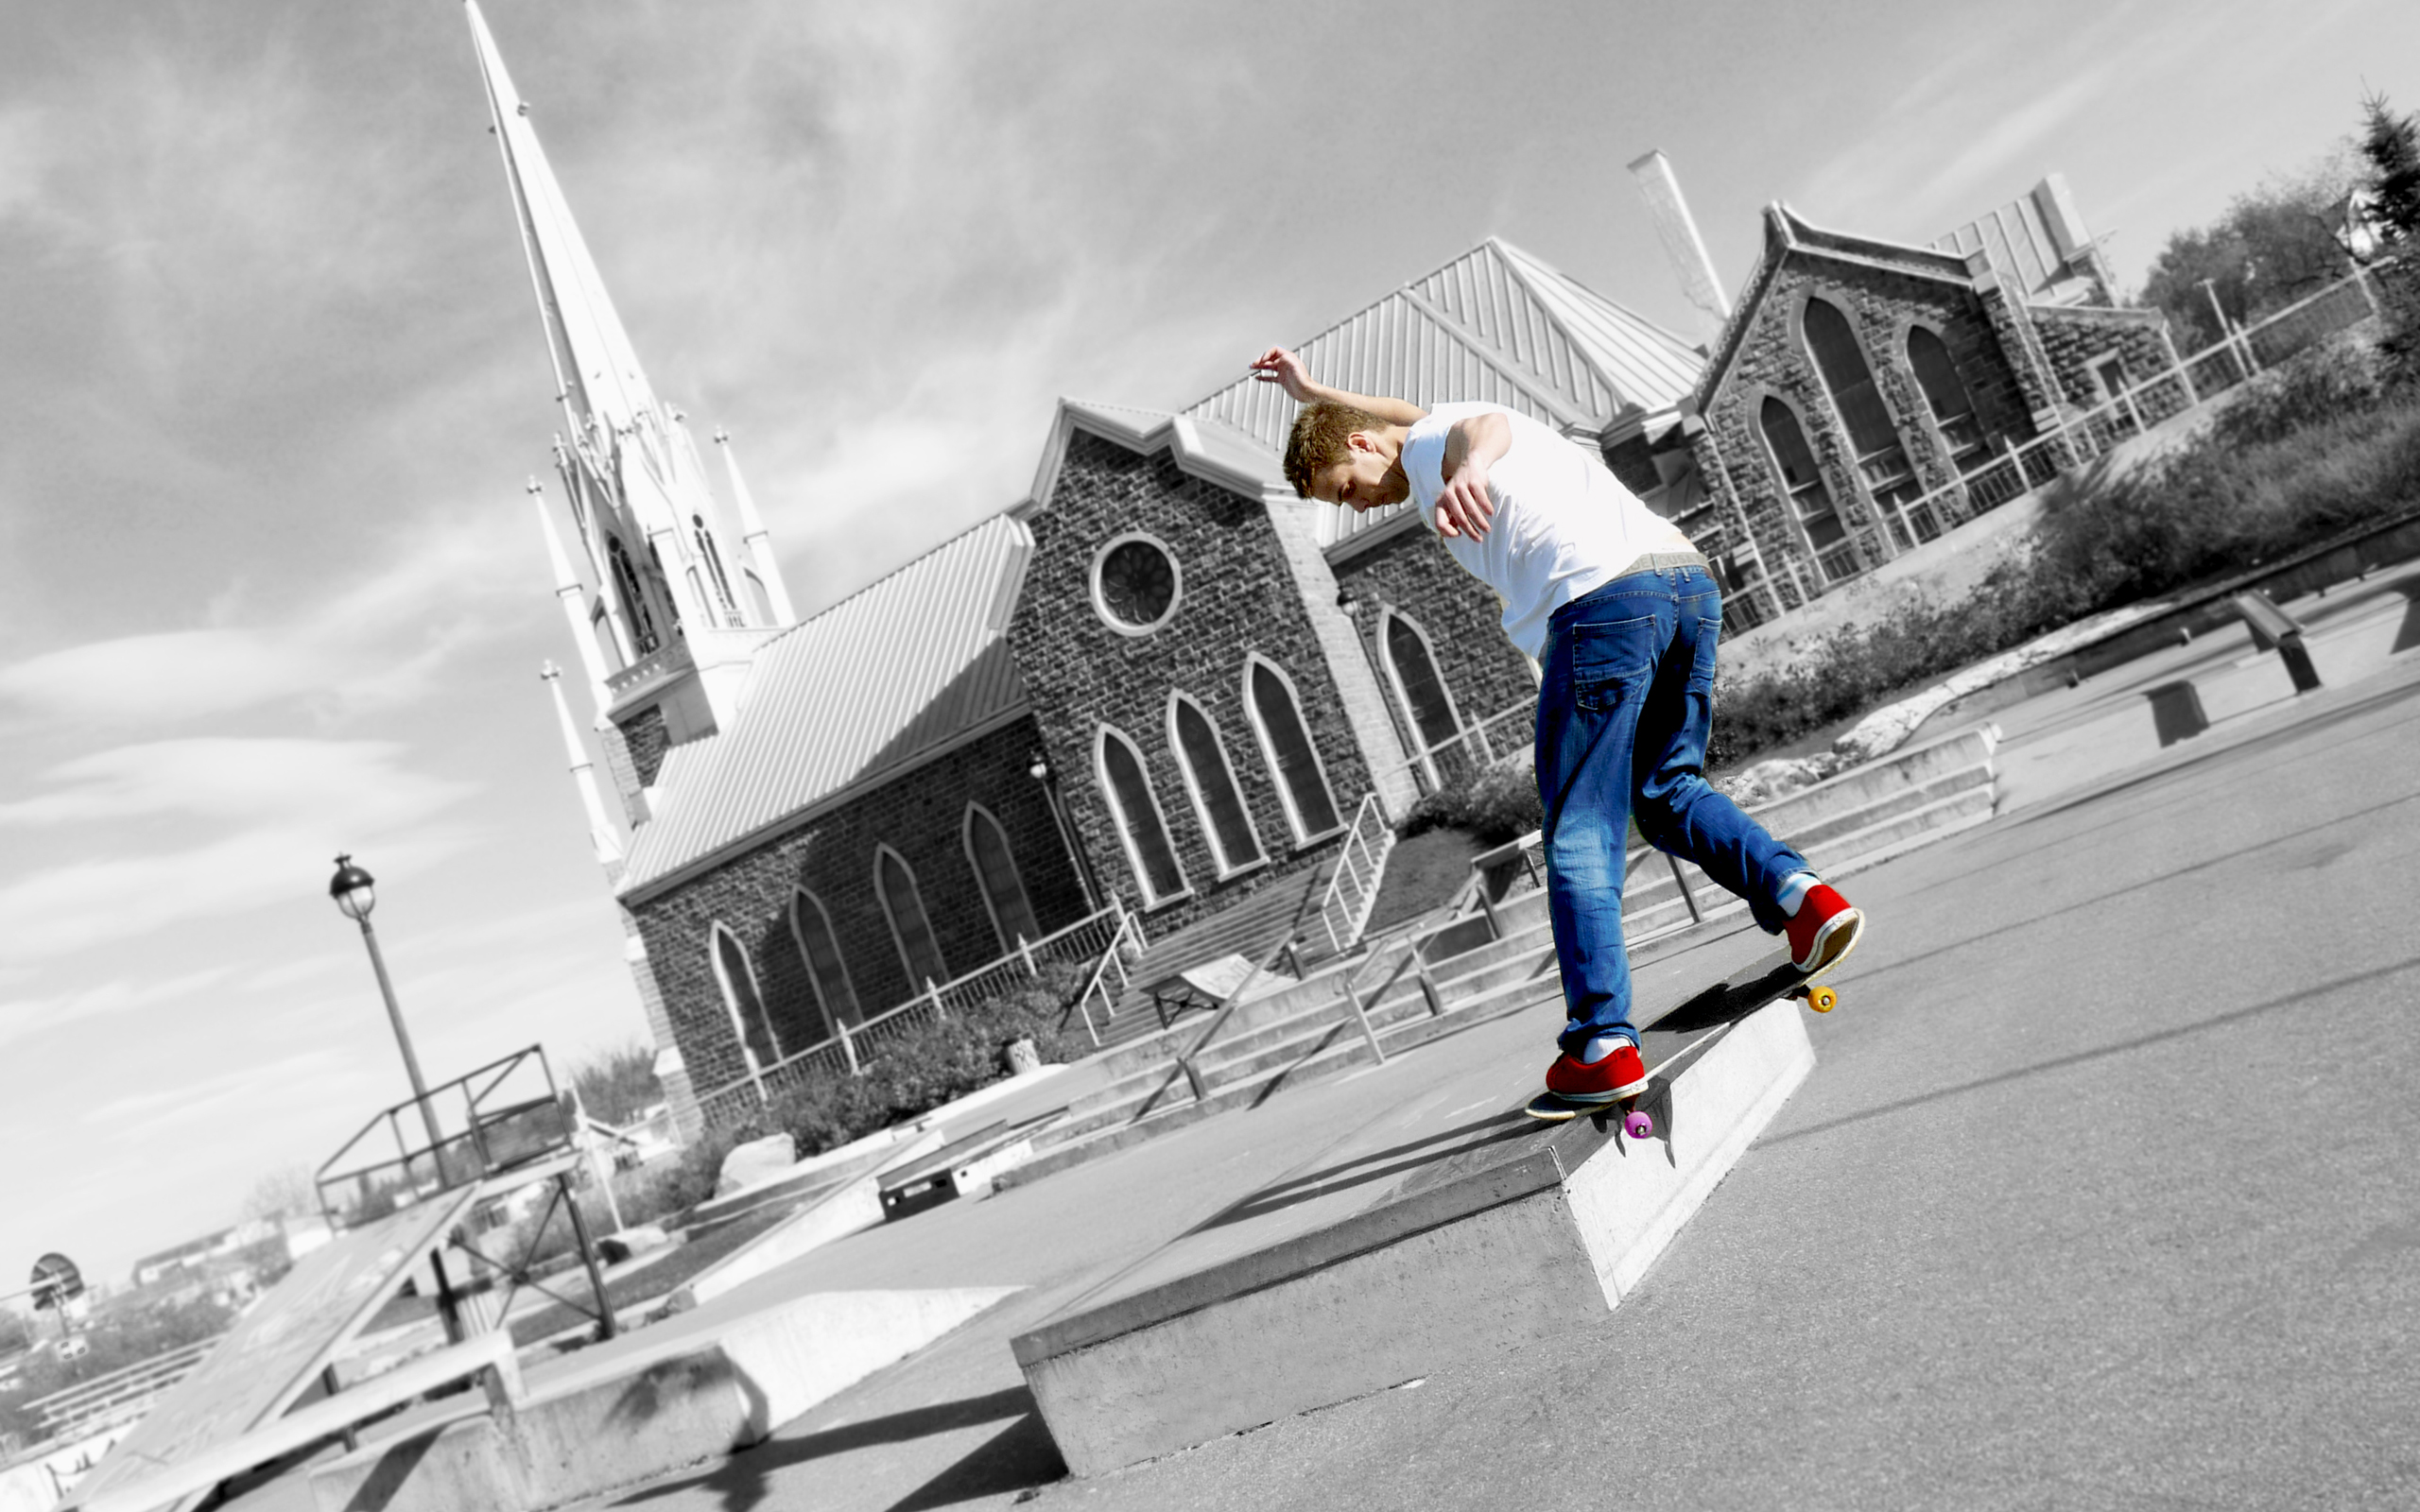 67 Skateboarding Wallpapers Skateboarding Backgrounds 2560x1600